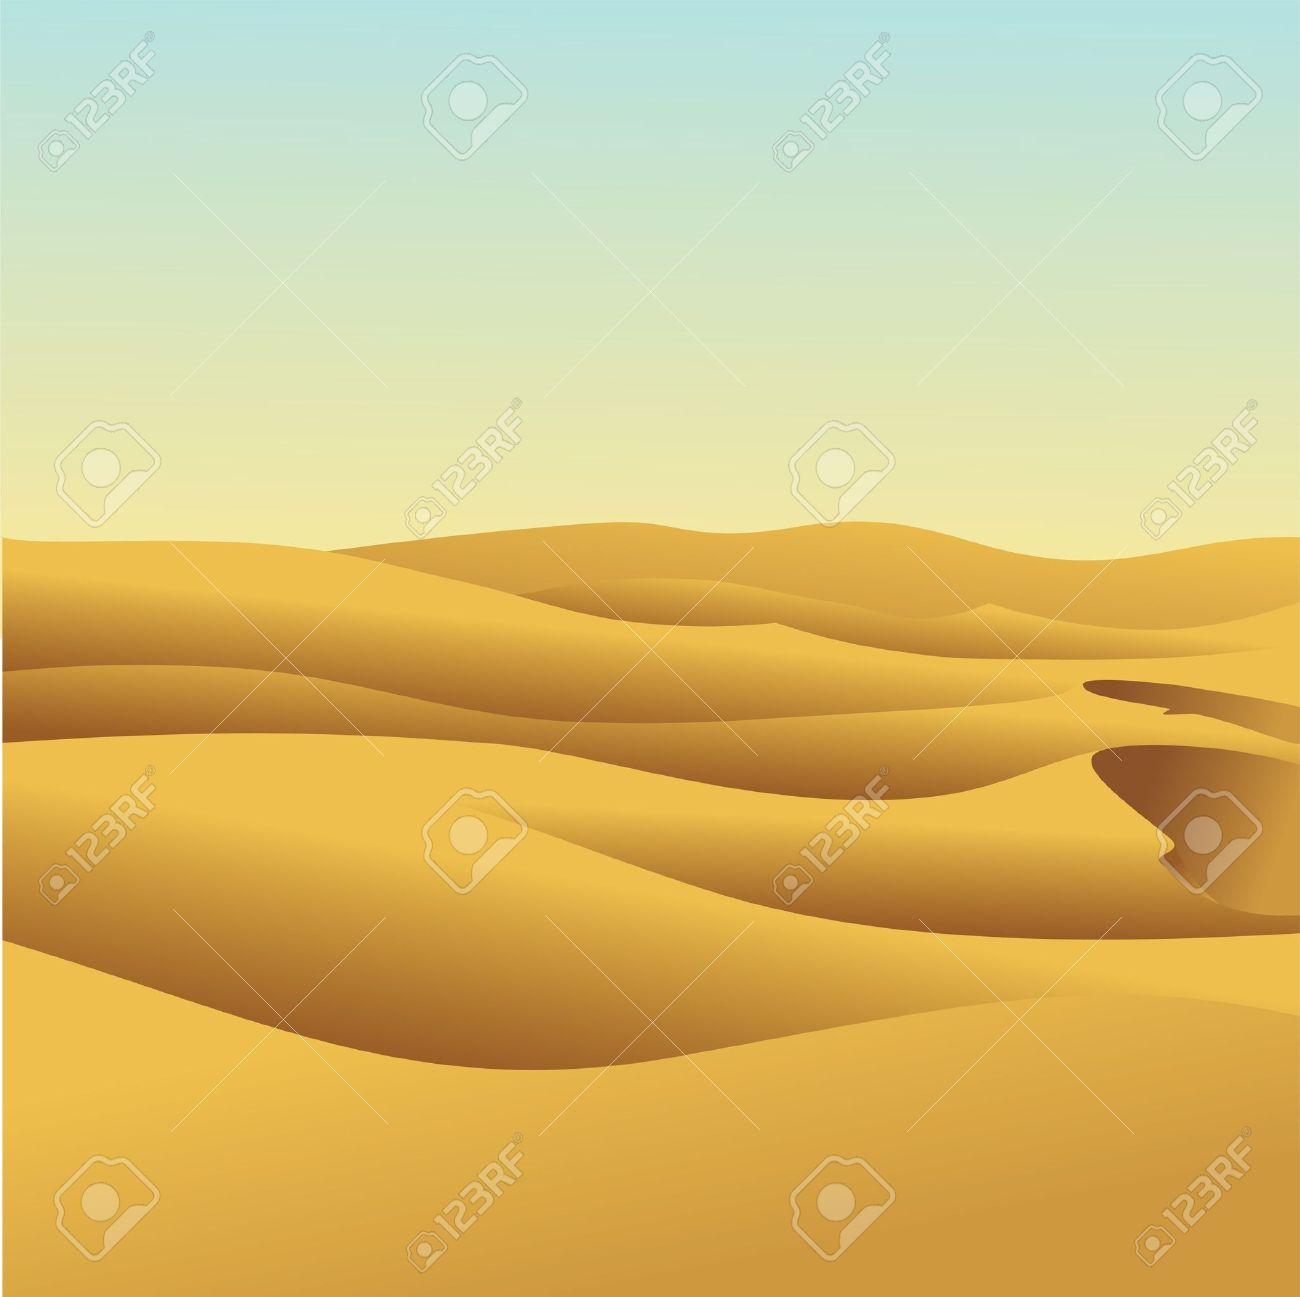 Sand dunes clipart 8 » Clipart Station.